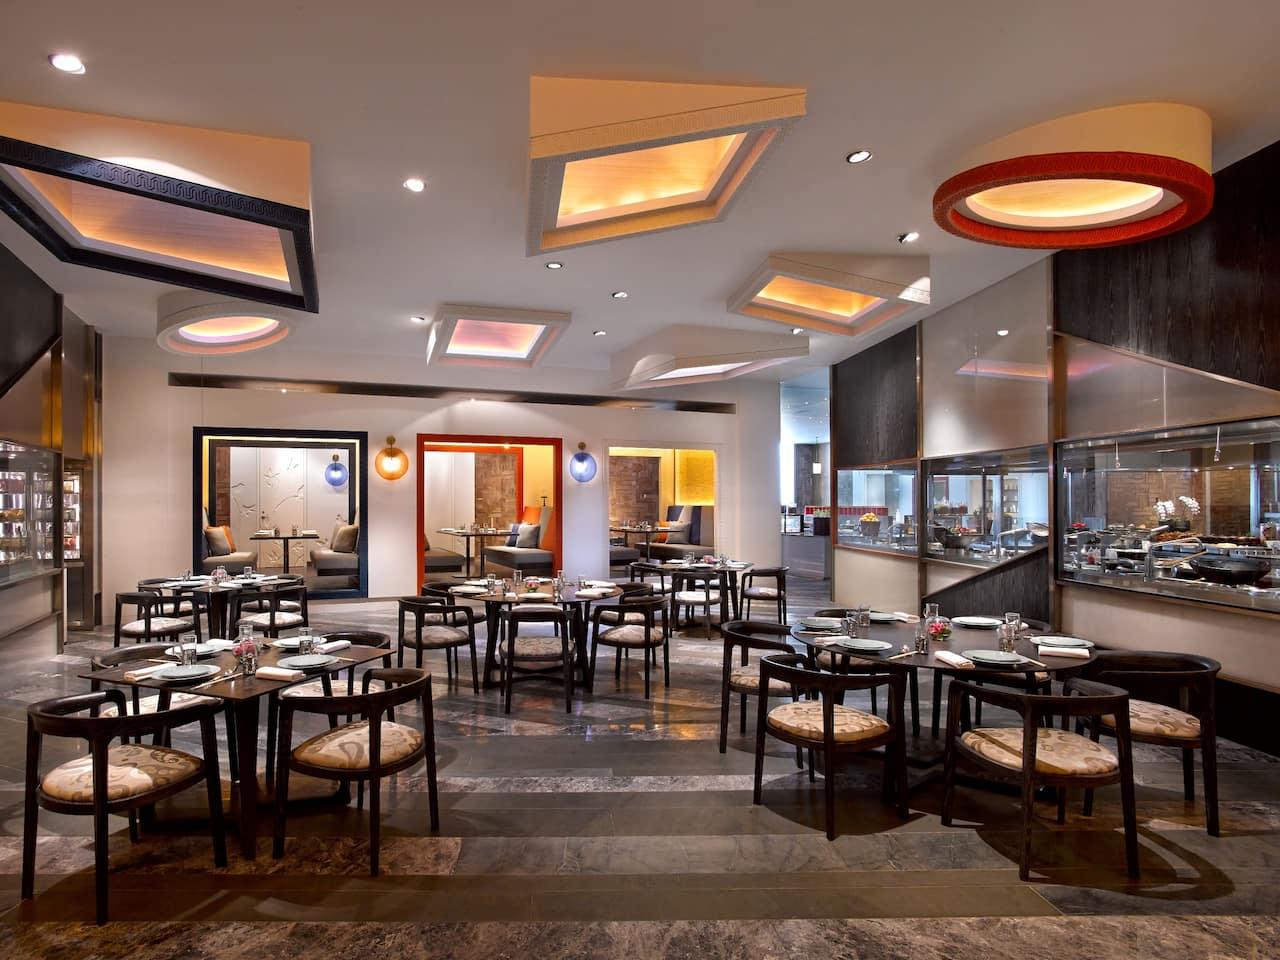 Hua Chi 88 Dining Area